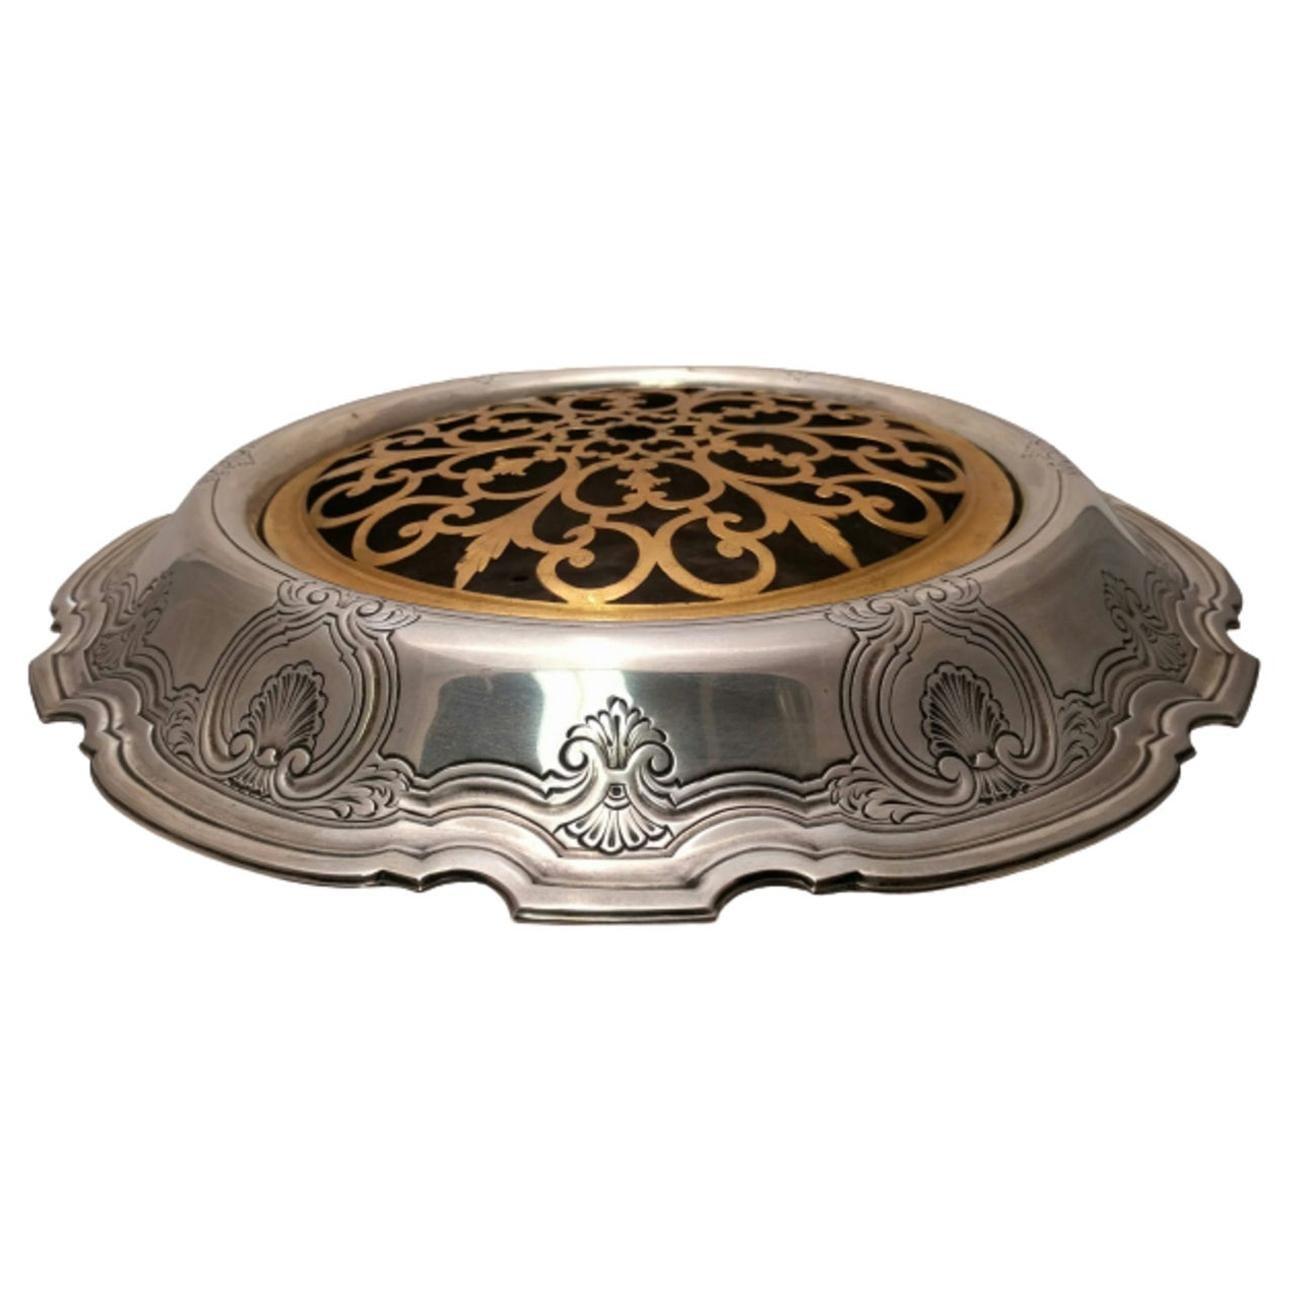 Tiffany & Co. Sterling Silver Monumental Flower/Fruit Centerpiece Bowl